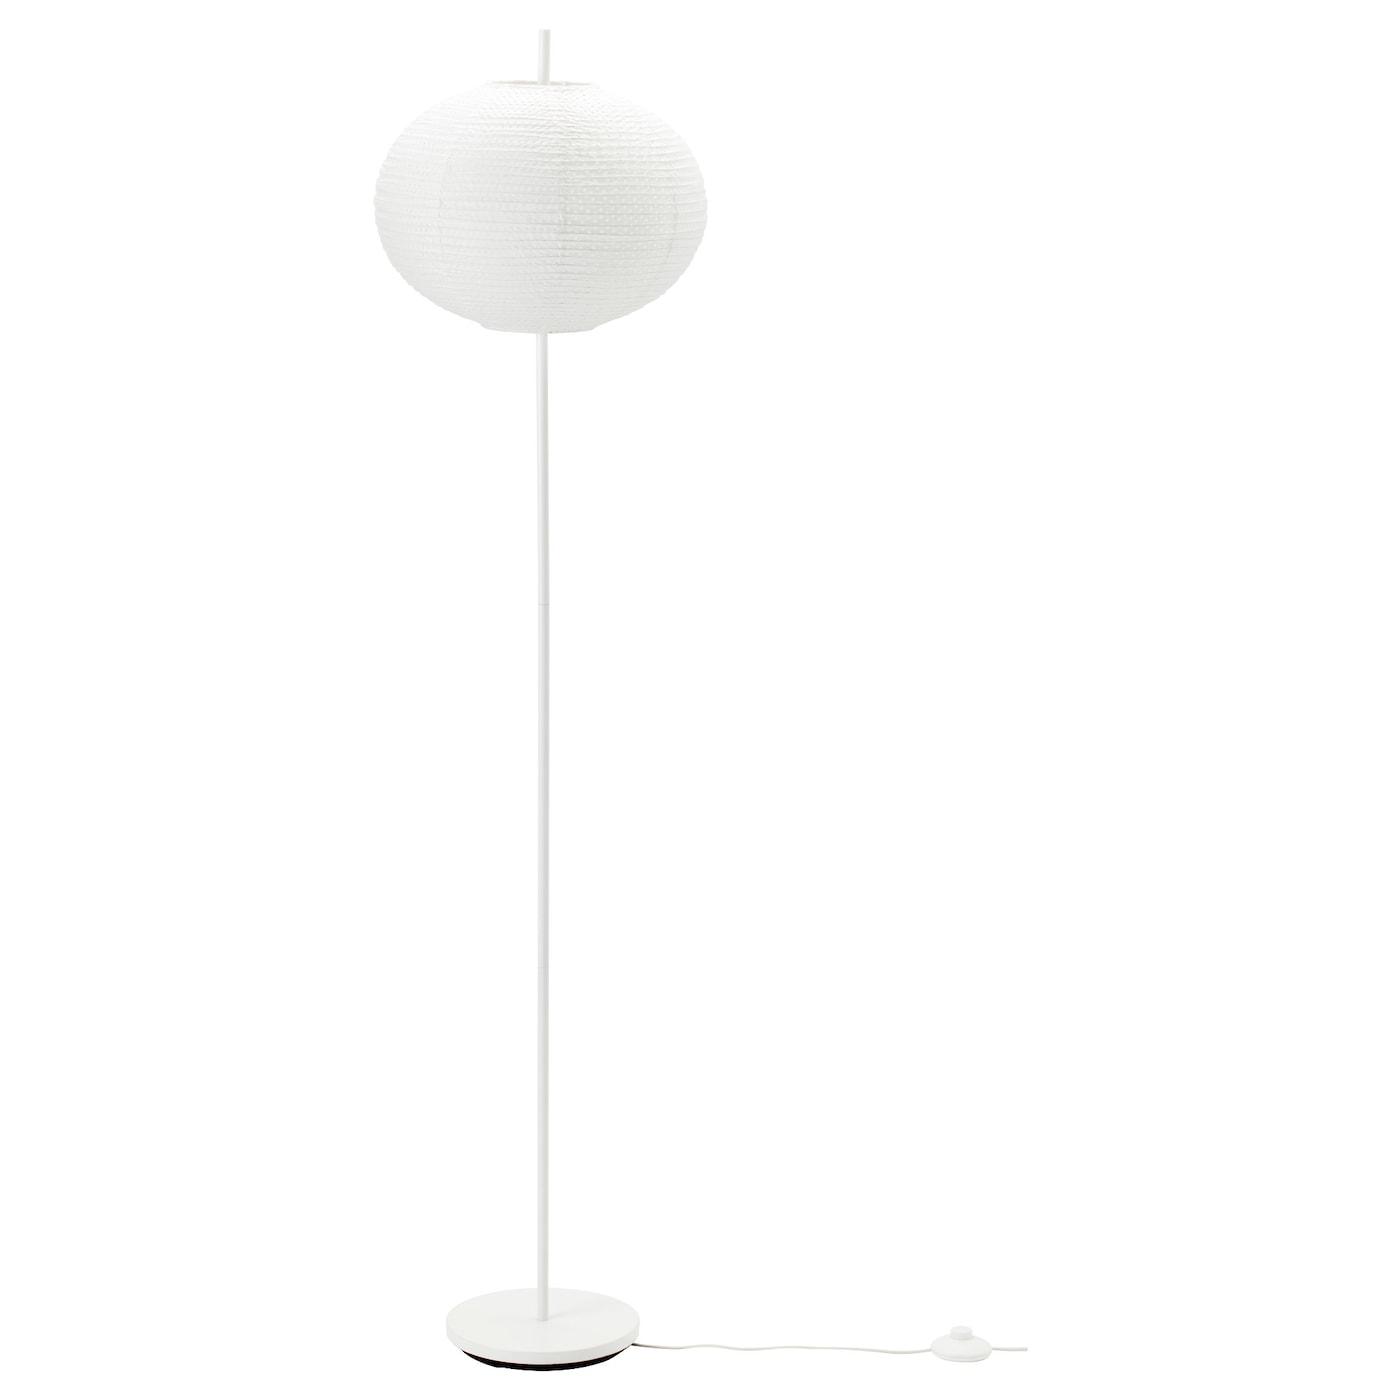 floor lamps standard lamps ikea. Black Bedroom Furniture Sets. Home Design Ideas